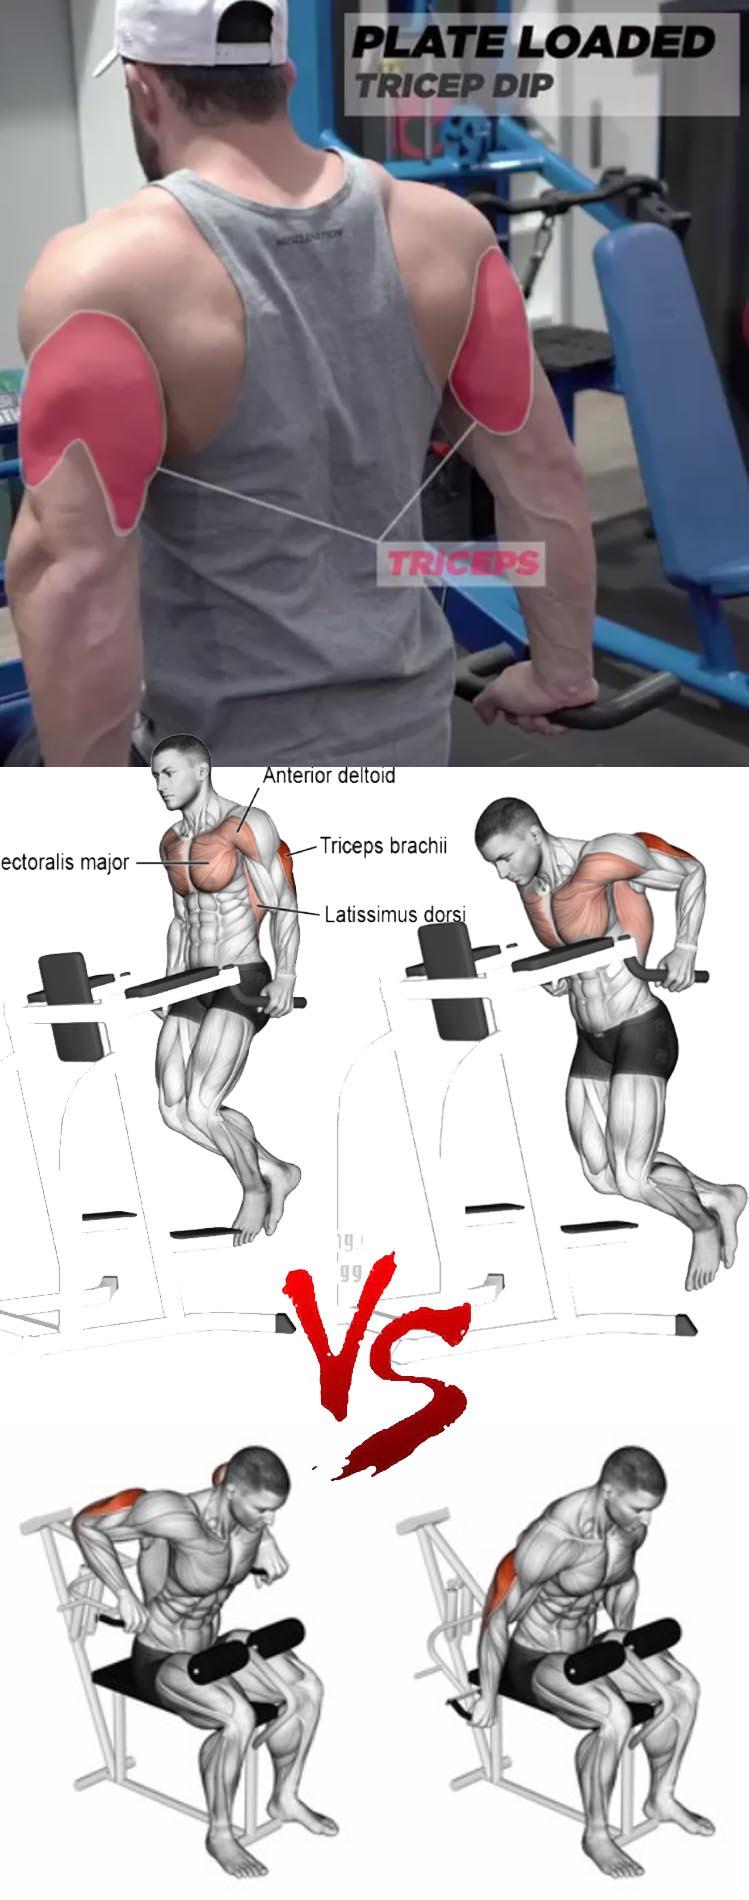 TRICEPS DIPS MACHINE VS Triceps Parallel Bar Dips